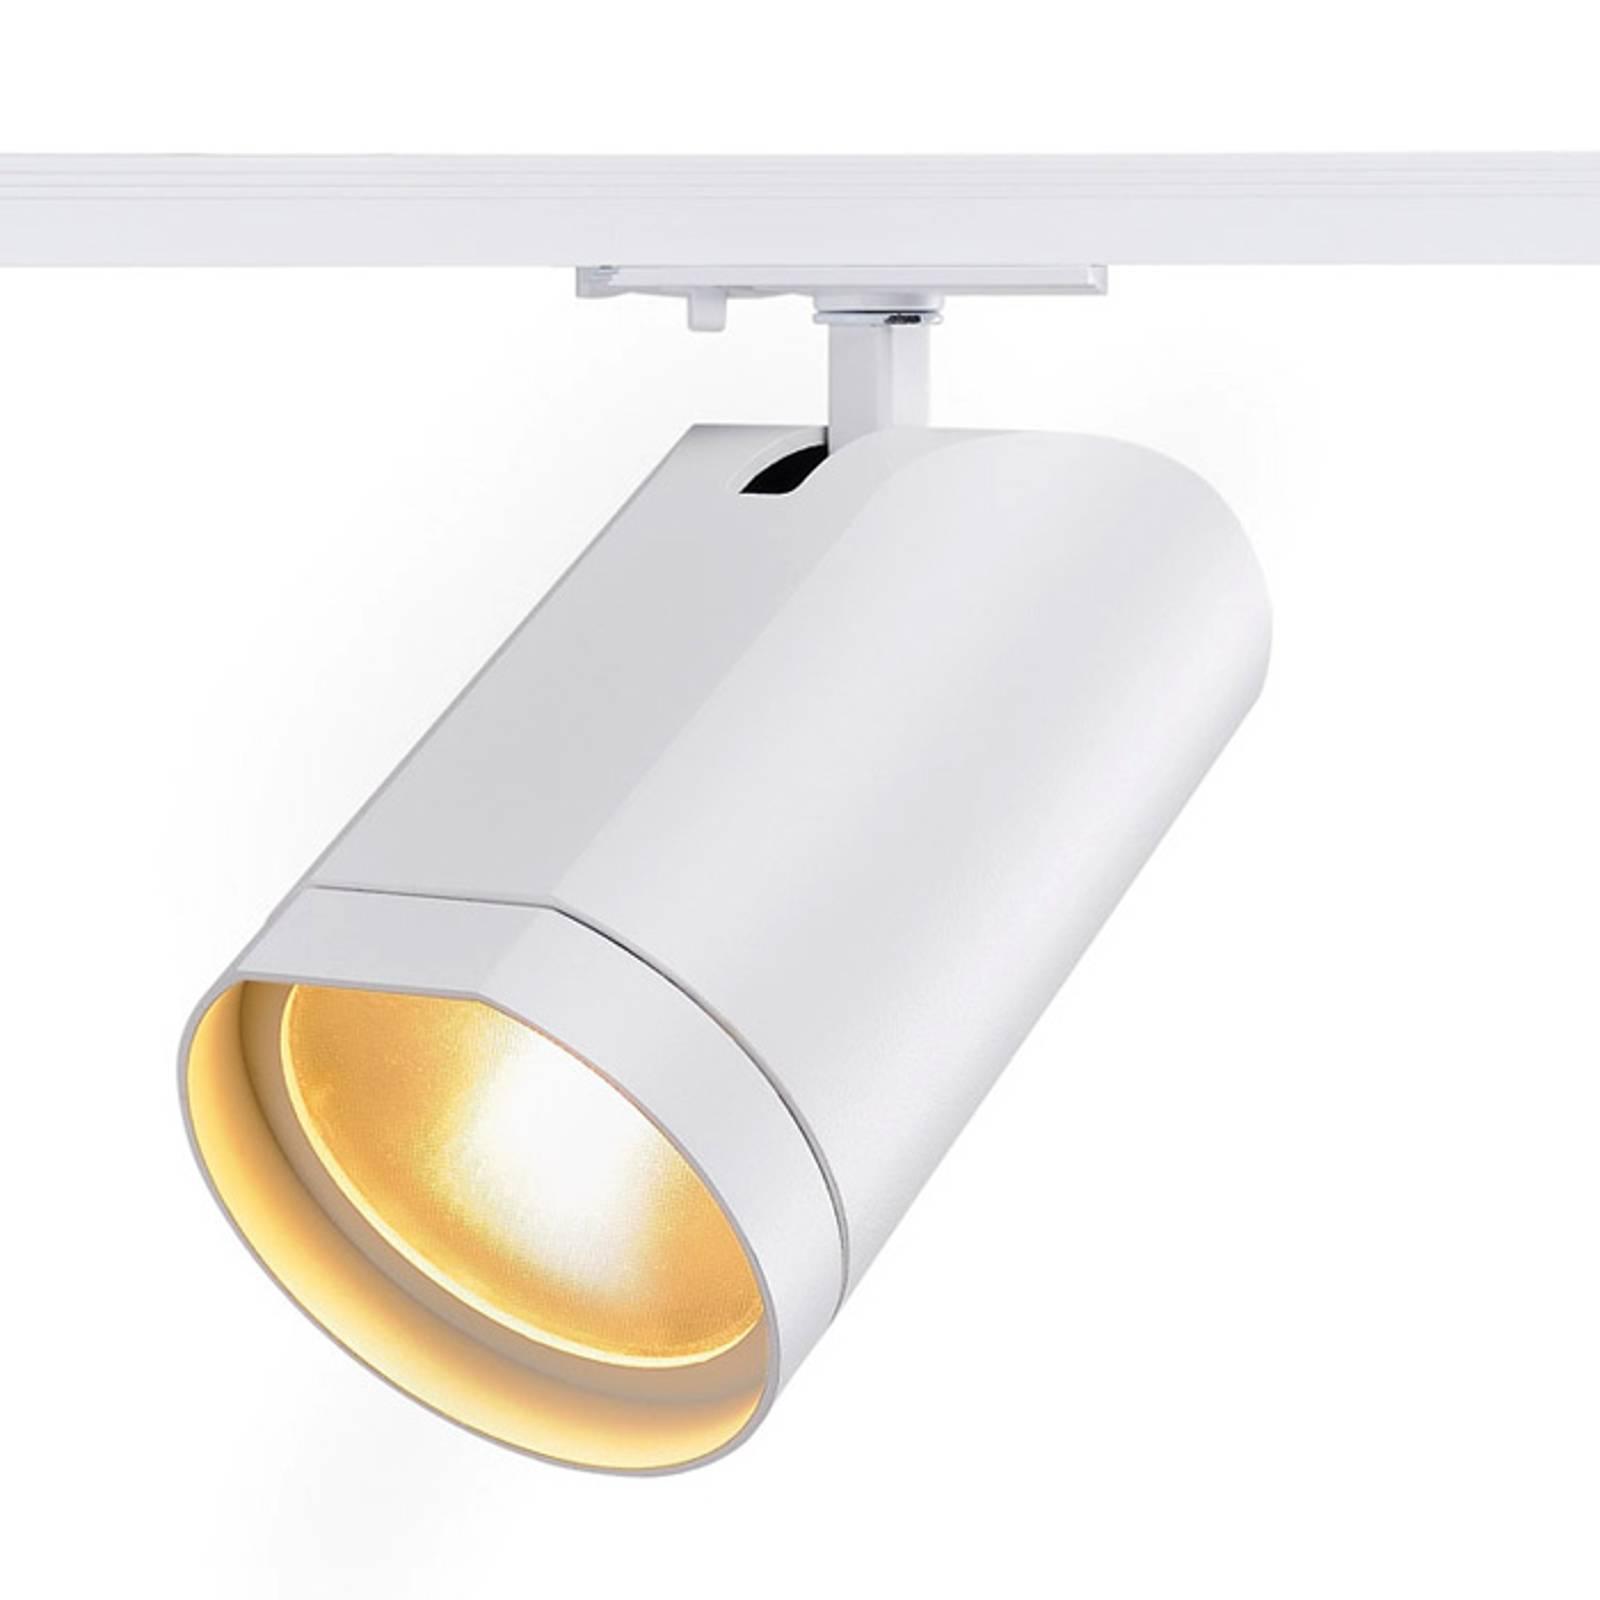 Heldere LED spot Bilas v. 1-fase stroomrail 60